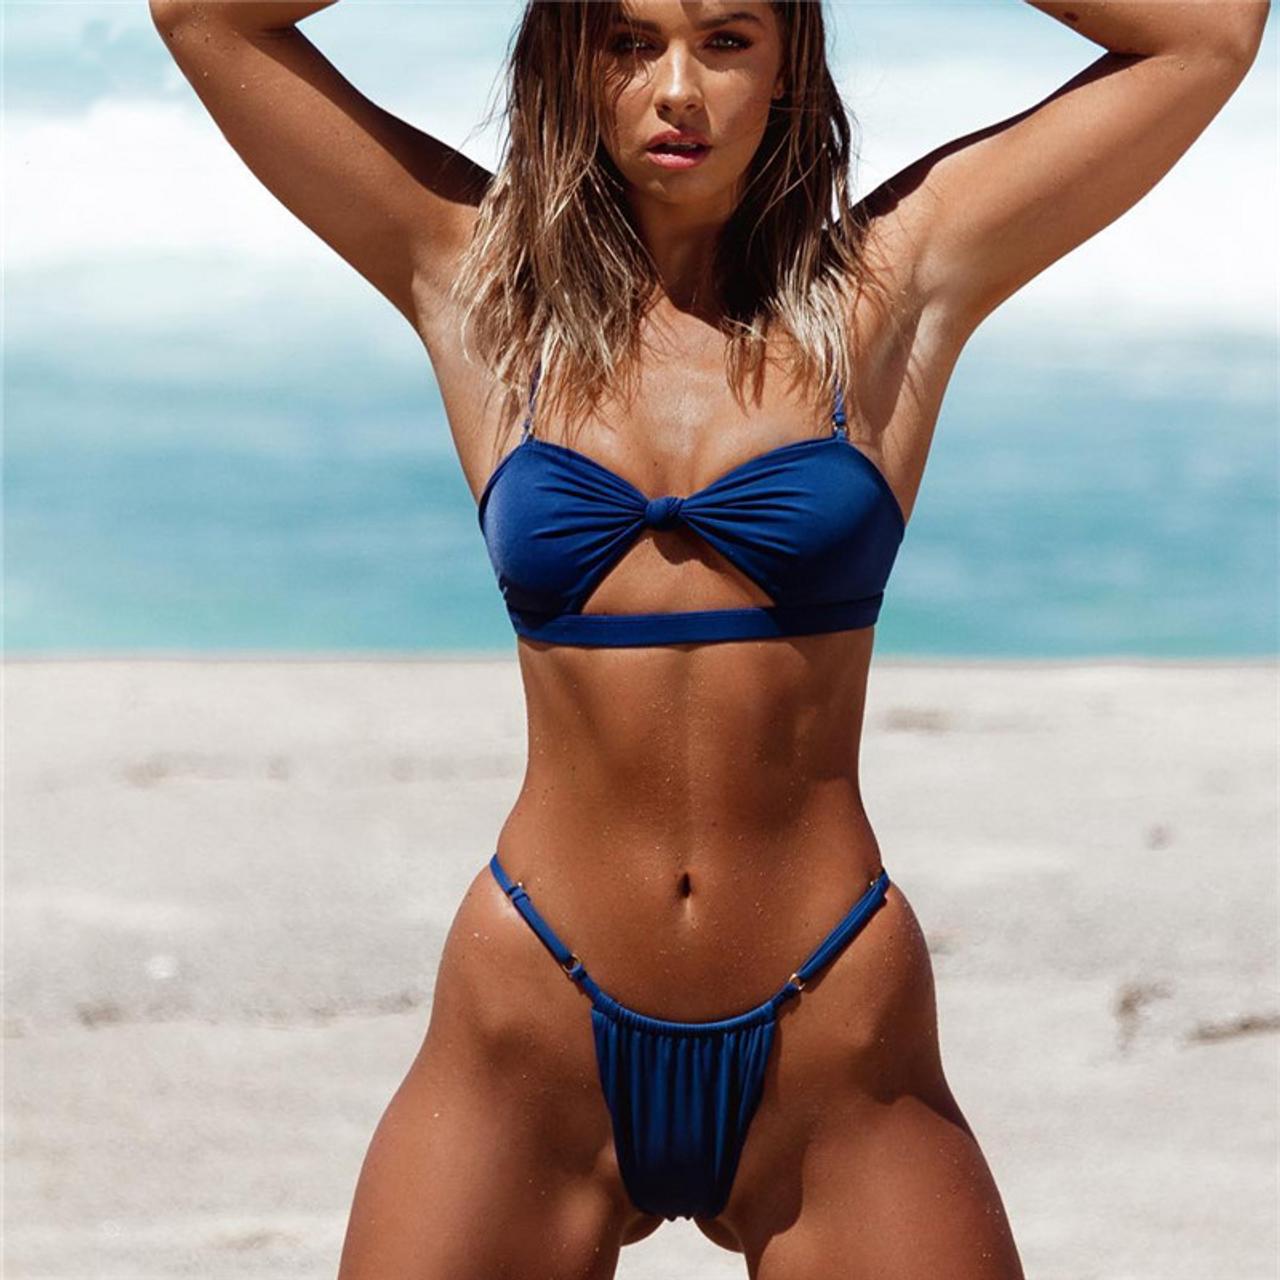 d1d2b2ea5b Solid Bikini Mujer Sexy Swimwear Swimsuit Bathing Suit Women Adjust Bikini  Push UP Beach Wear Biquini Monokini